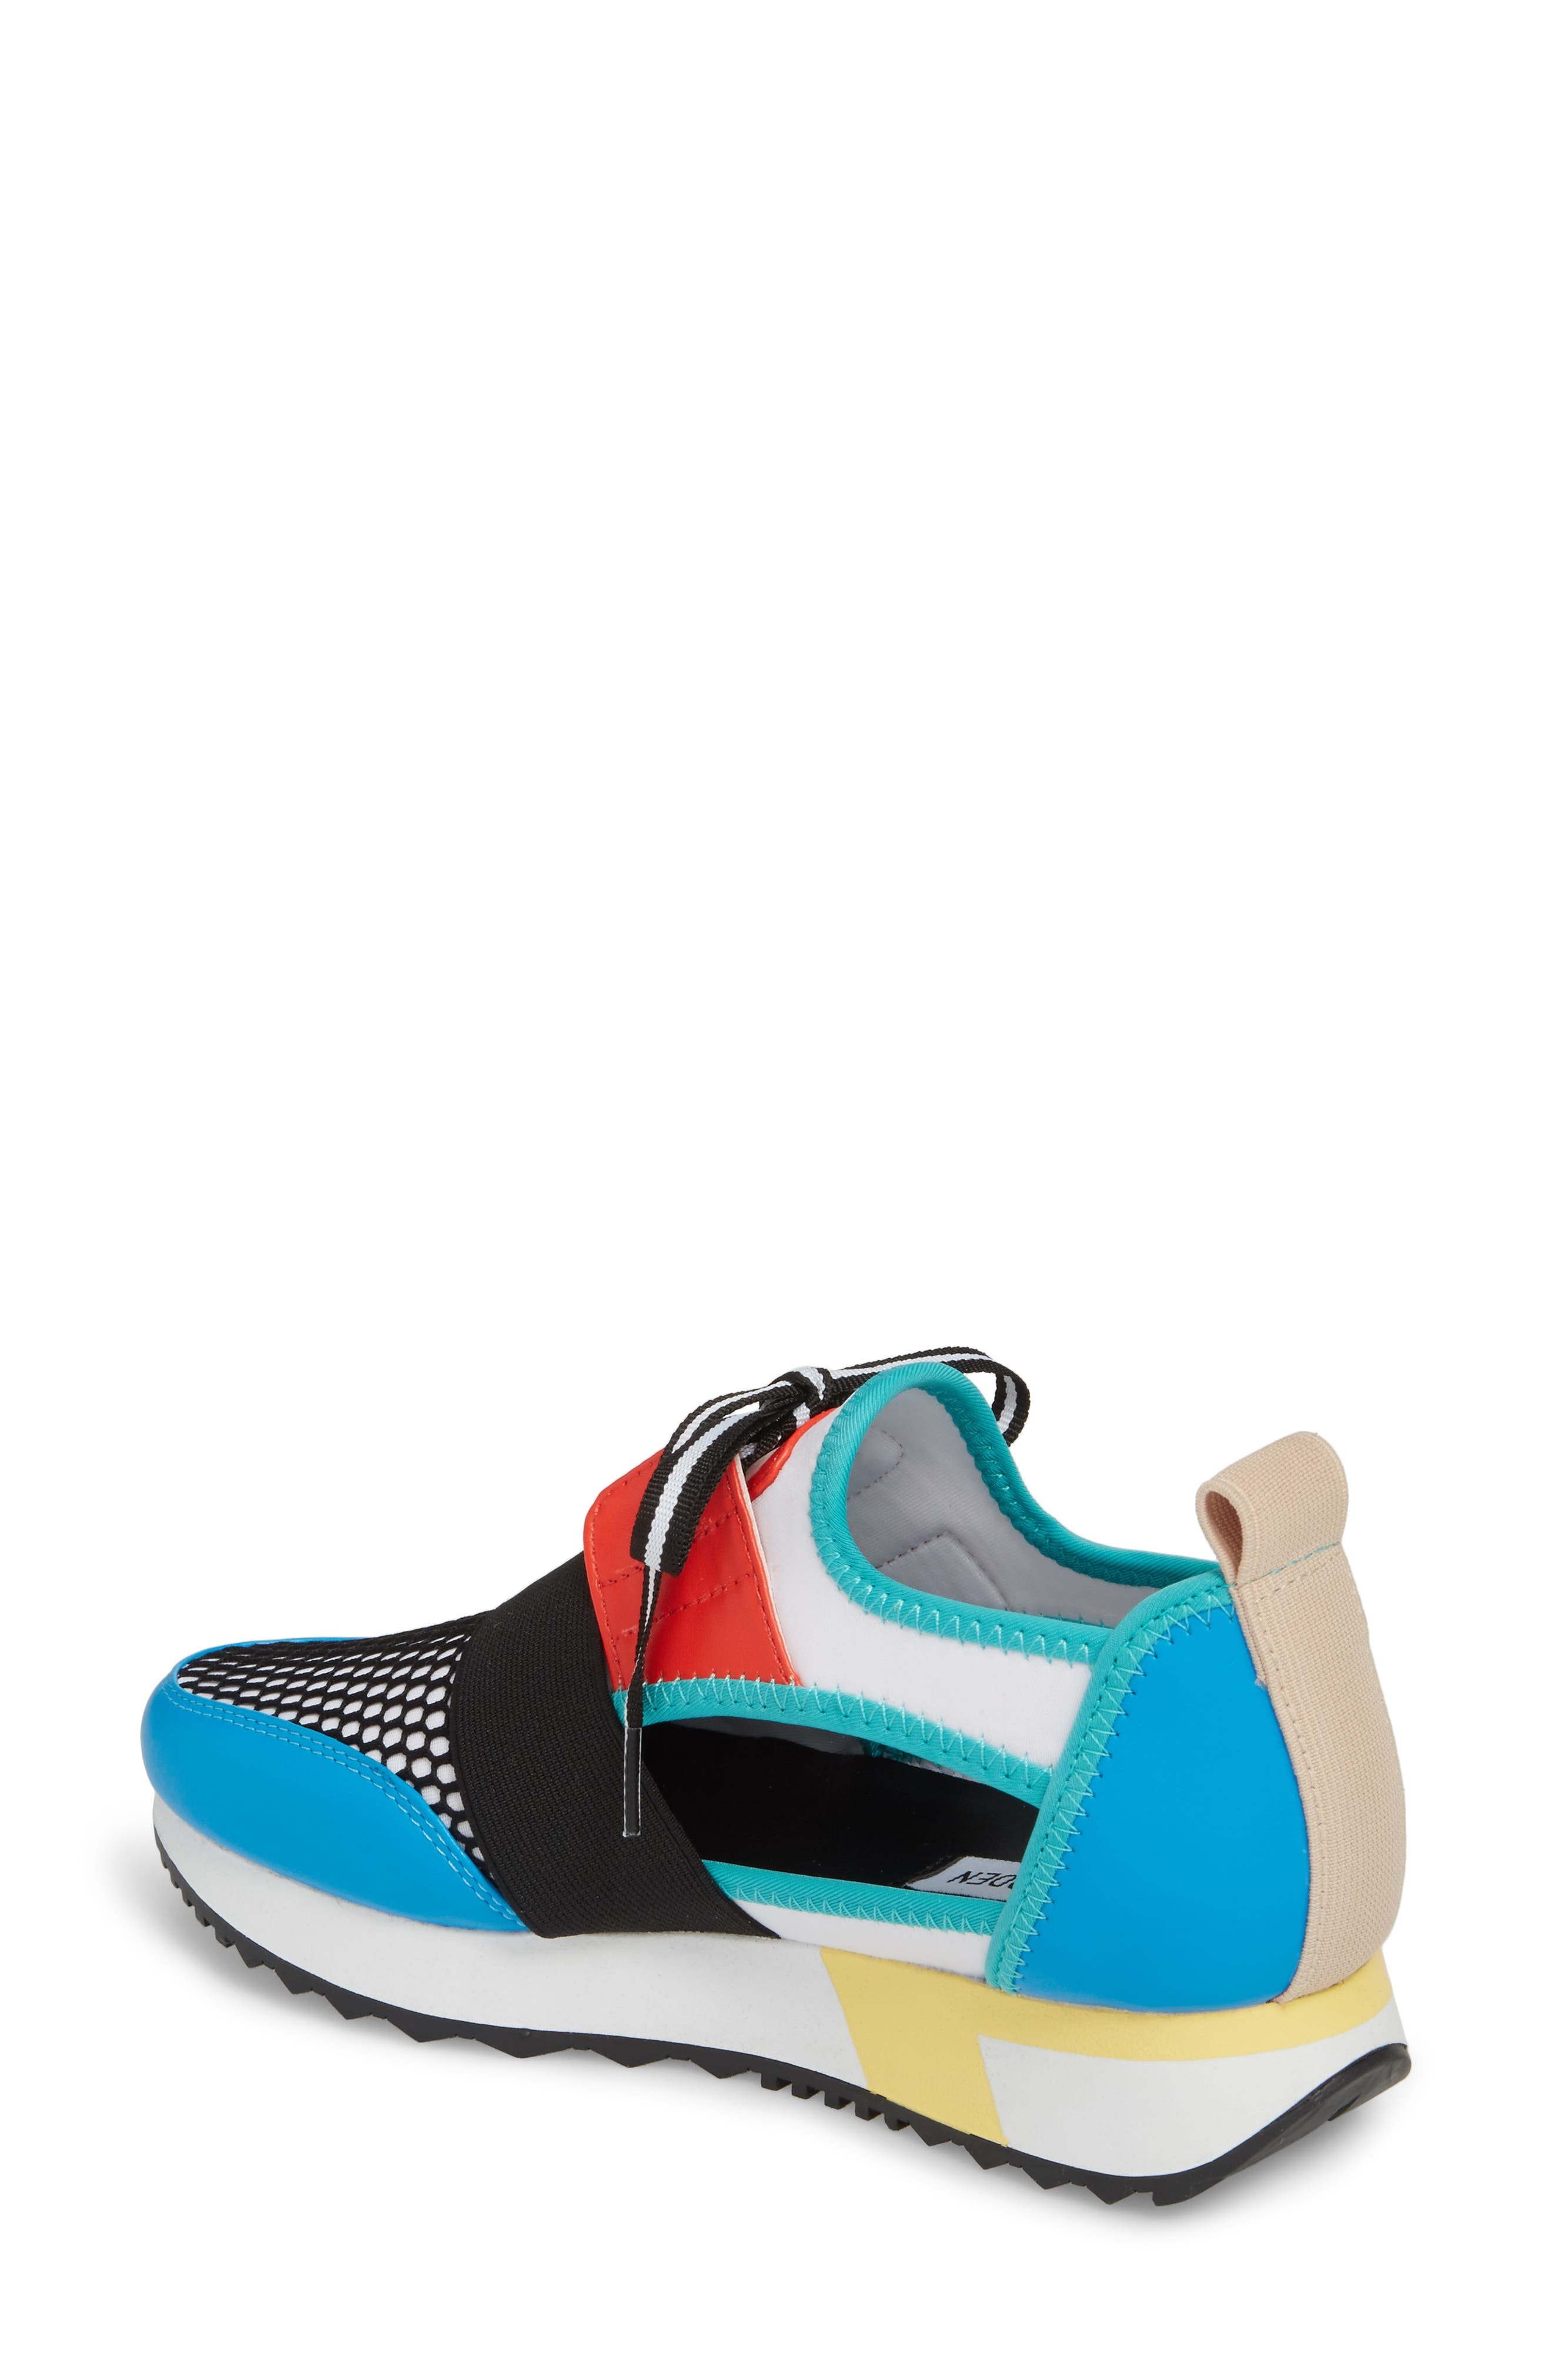 Arctic Sneaker,                             Alternate thumbnail 2, color,                             Bright Multi